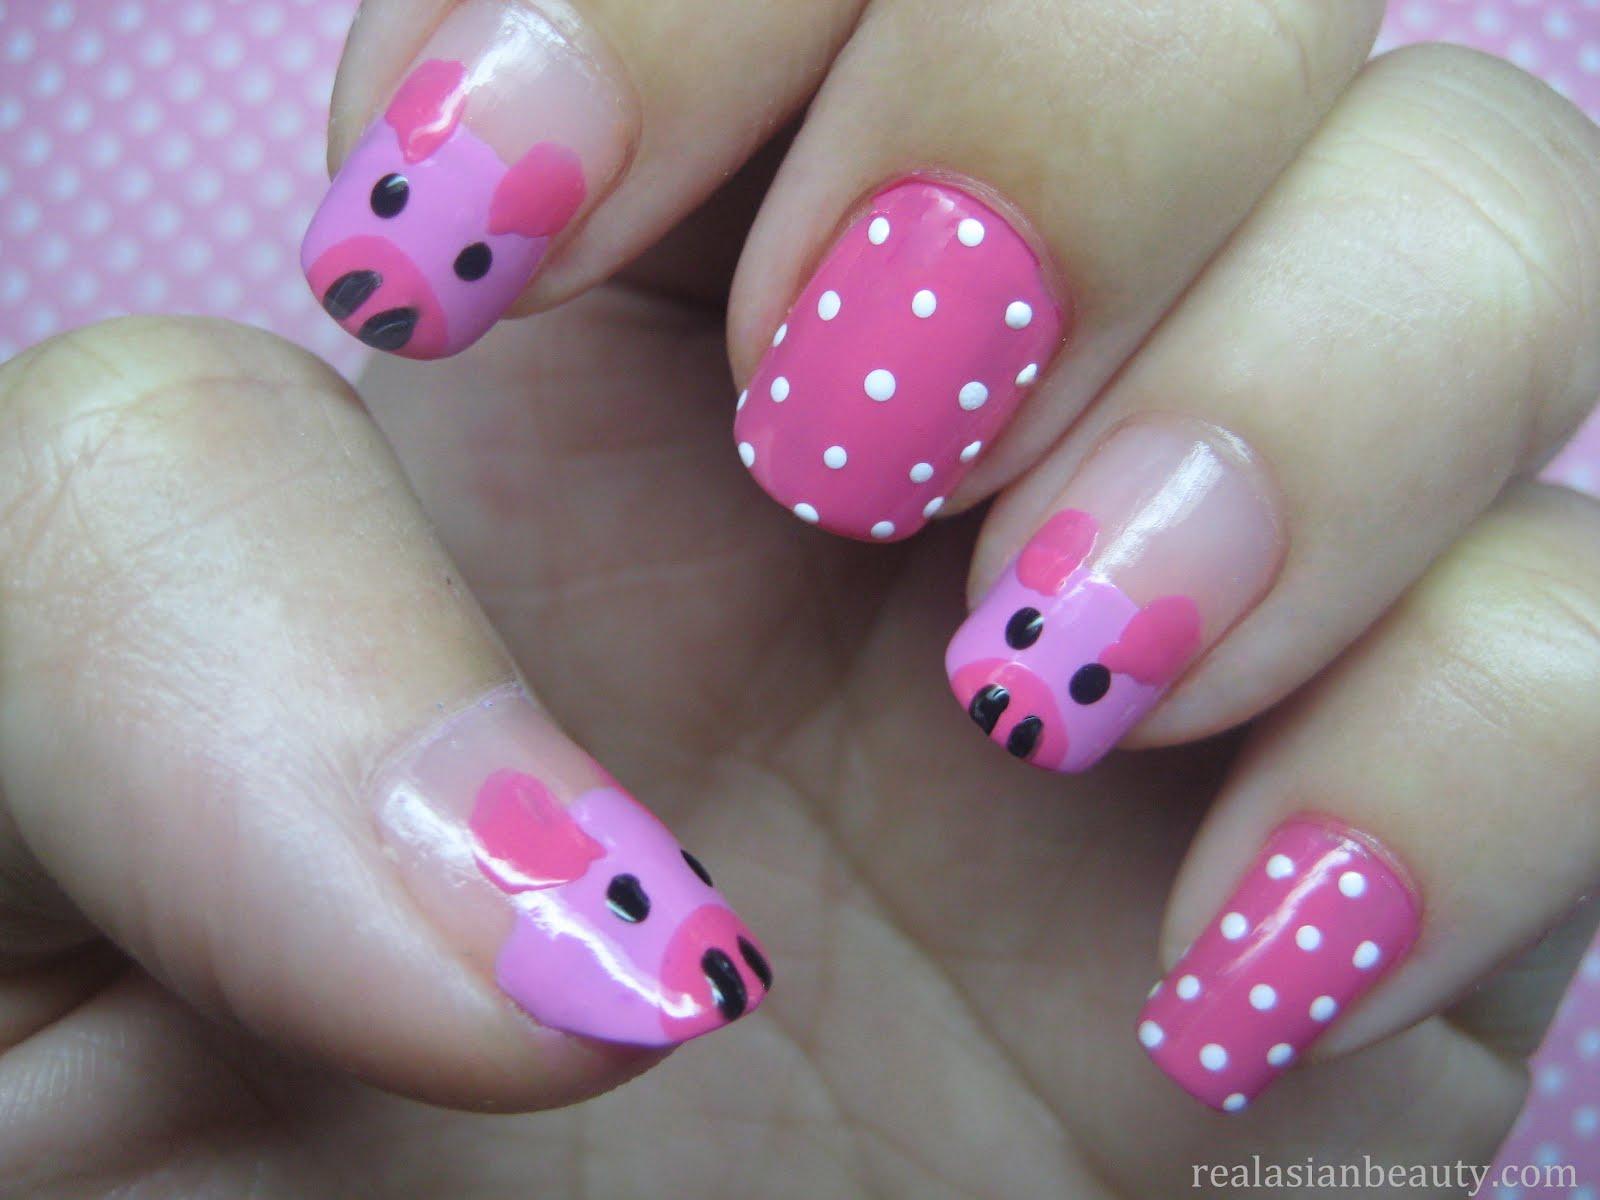 Real Asian Beauty: Cute Little Pigs Nail Art